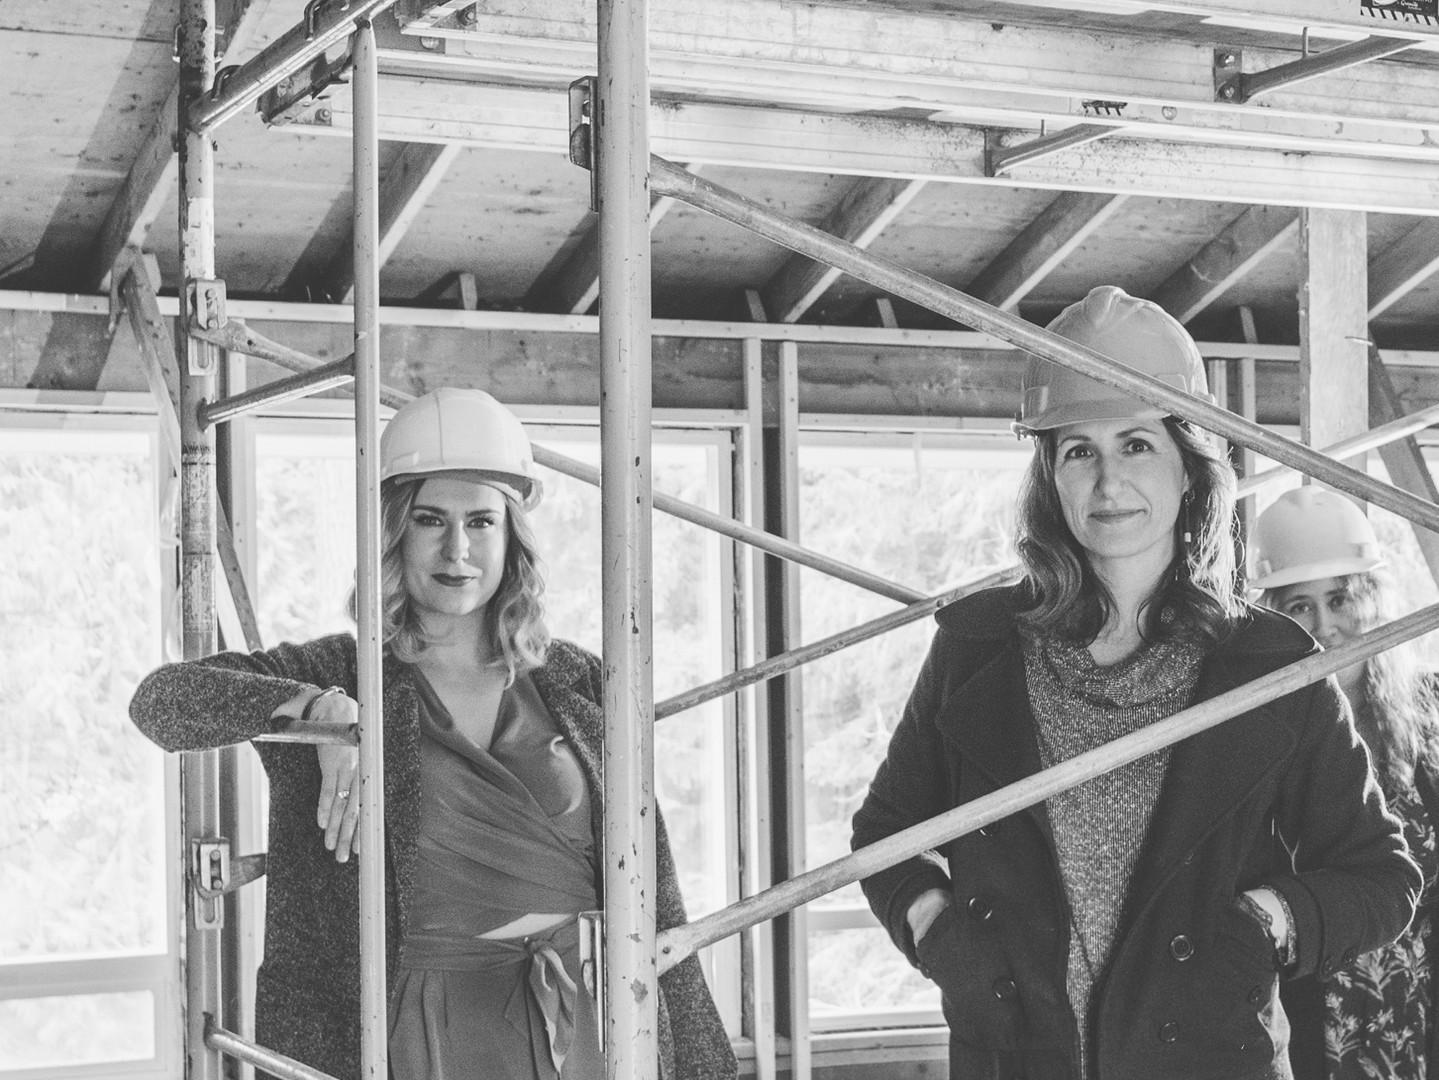 Principal Architects Tessa Smith & Roussa Cassel